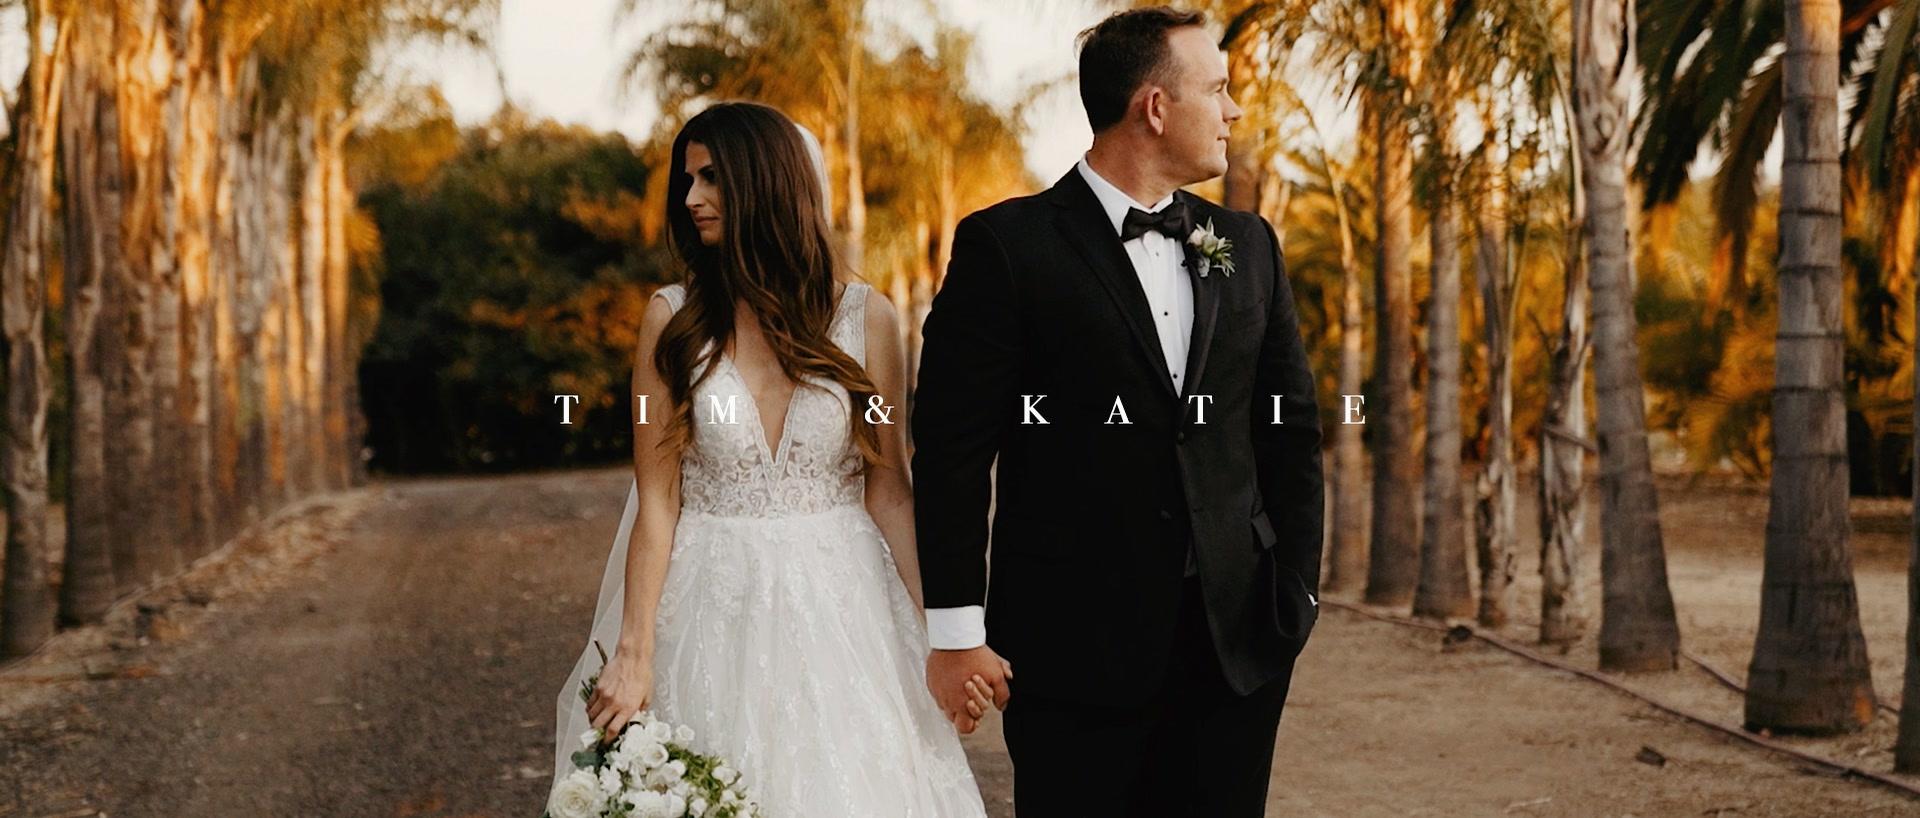 Tim + Katie   Oceanside, California   Paradise Falls